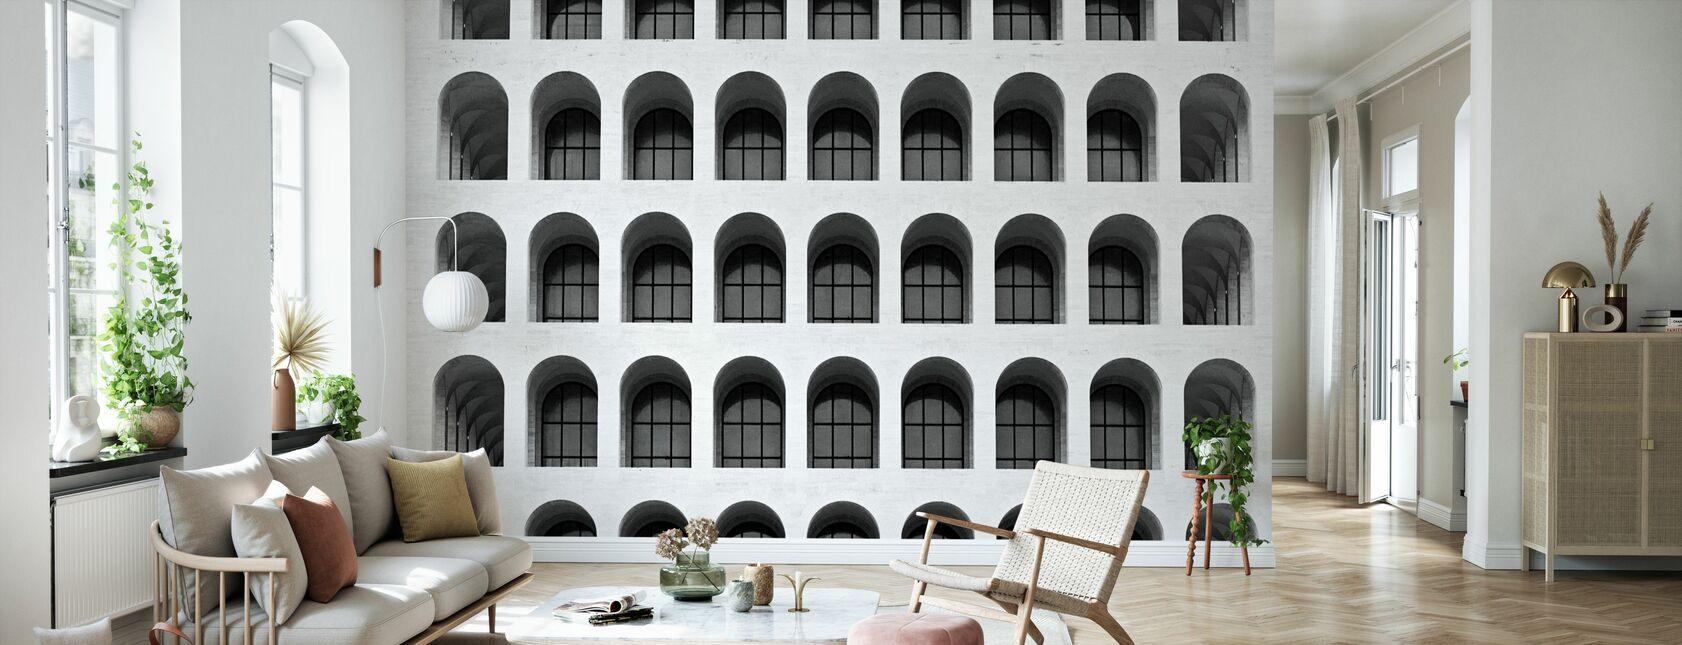 Colosseum Windows - Wallpaper - Living Room